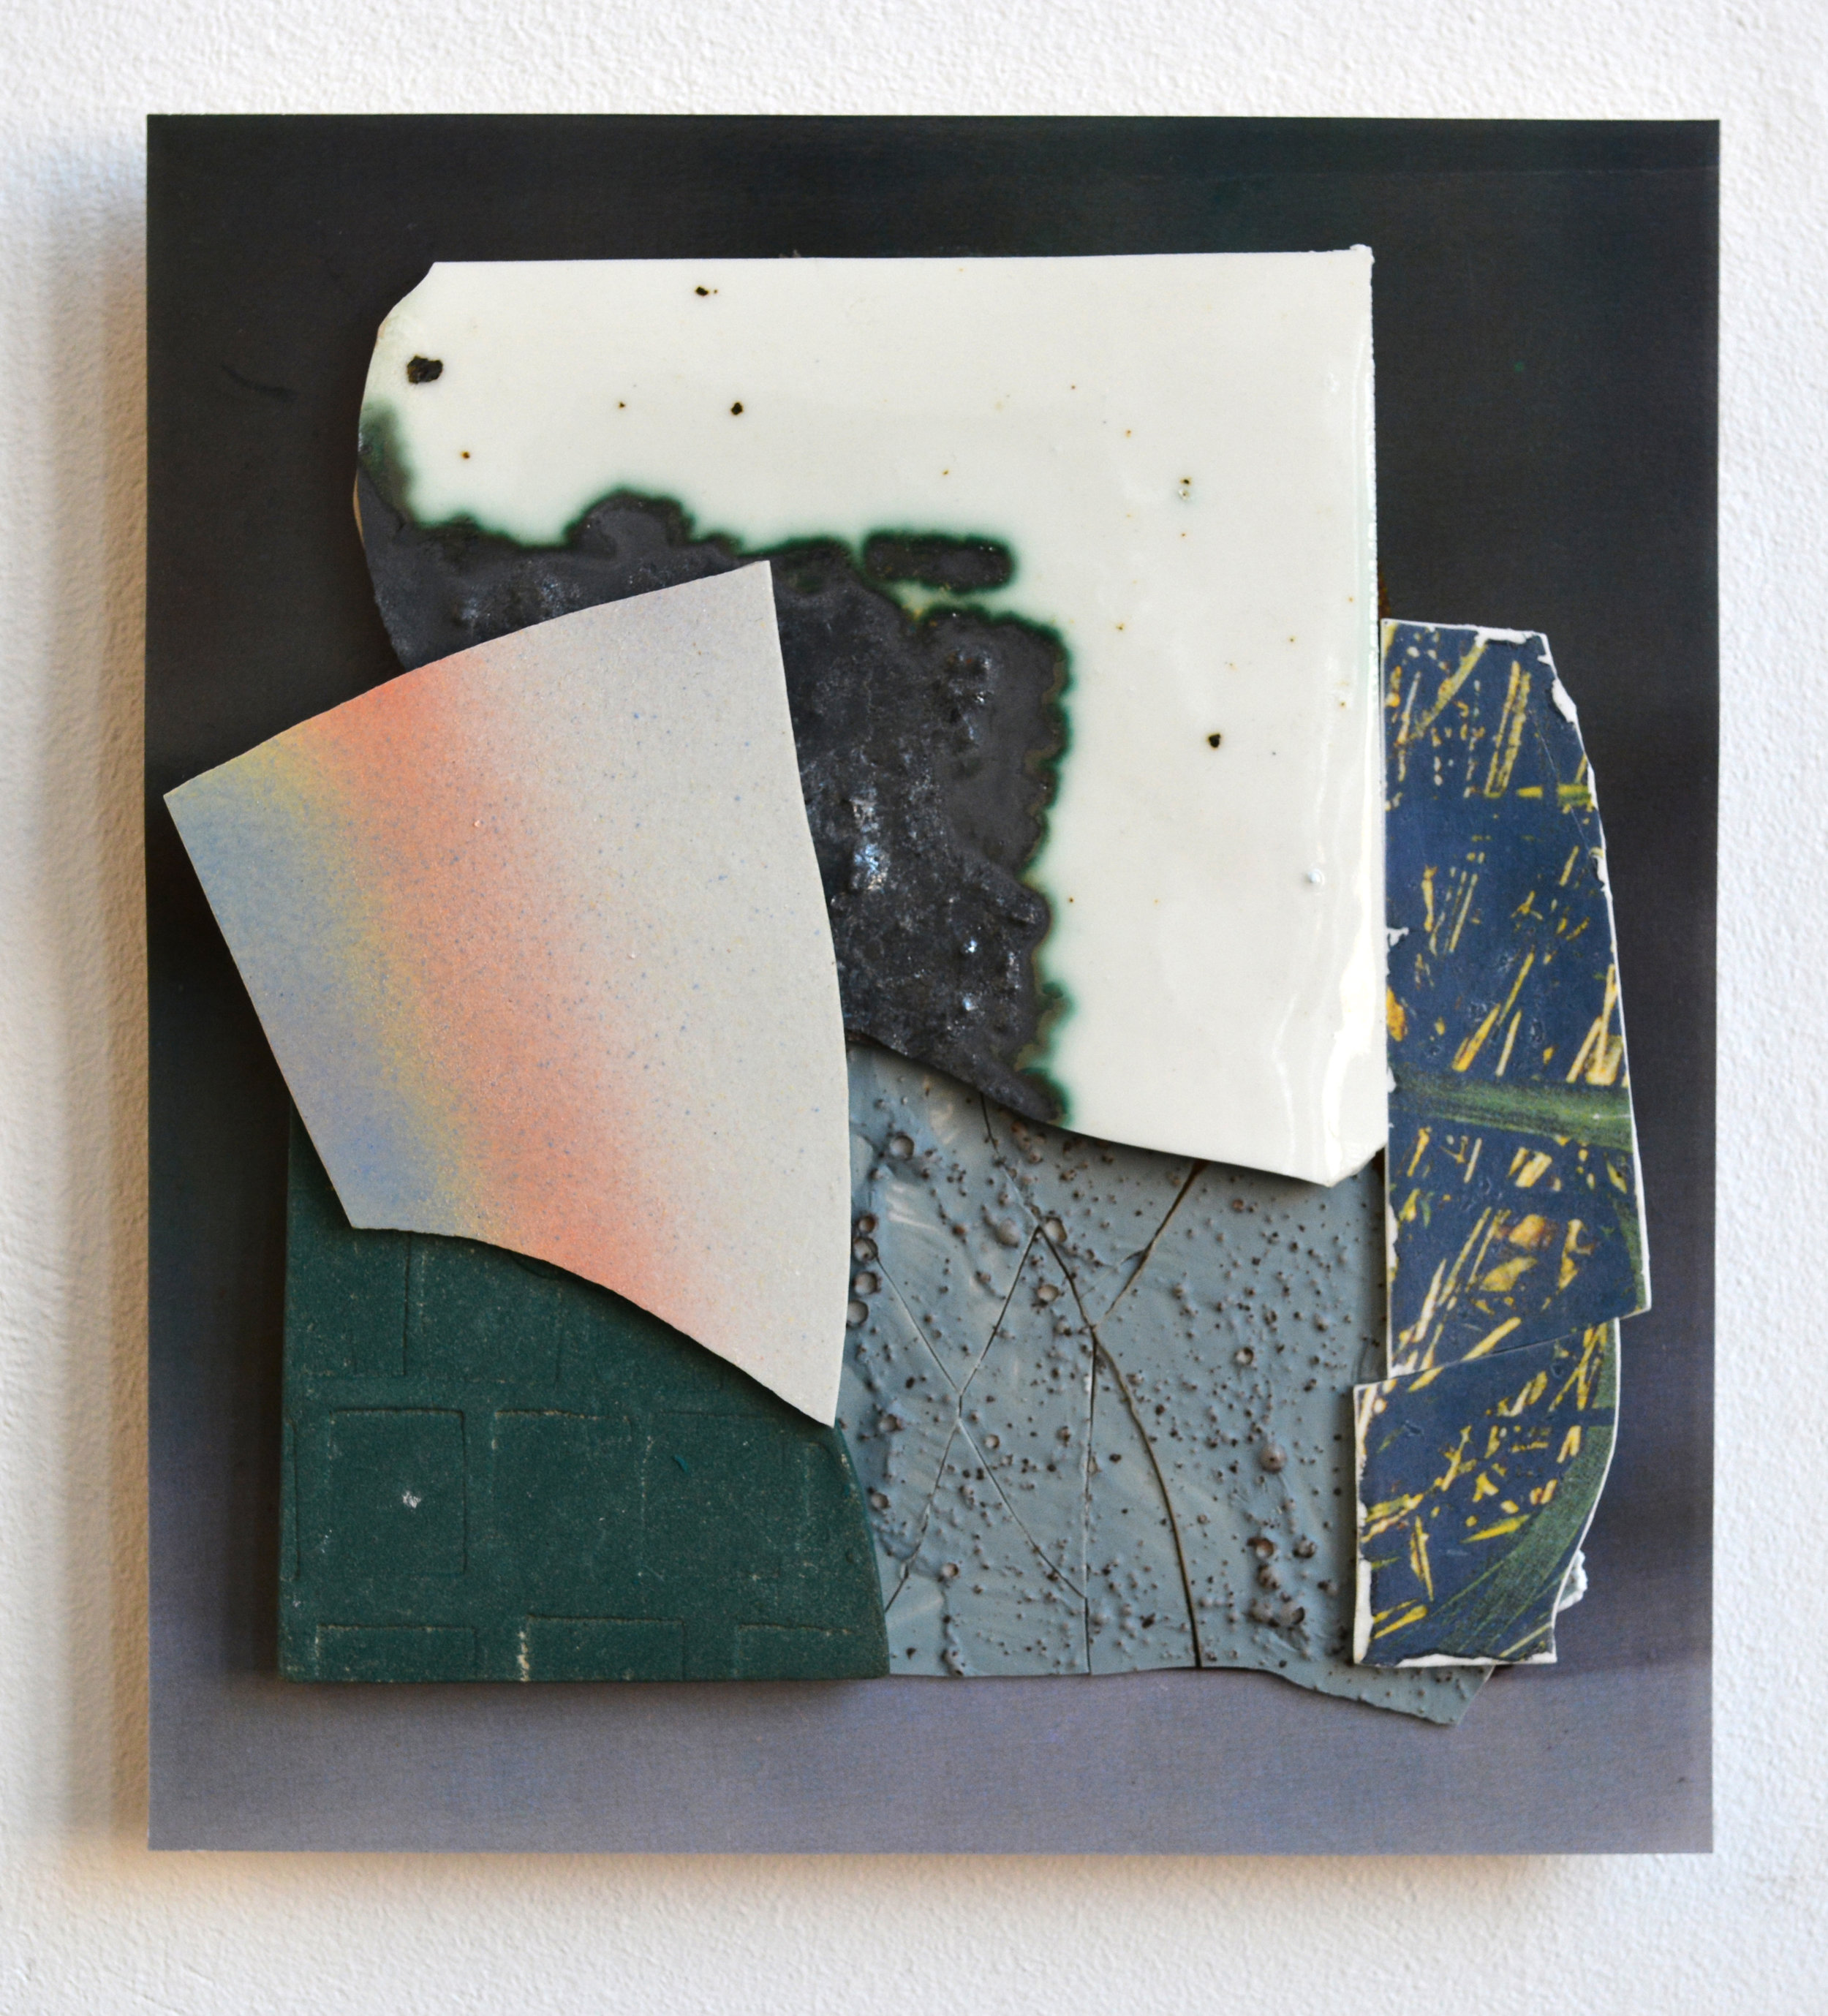 N.t., 2015, ceramic on print, 21 x 19 cm..jpg